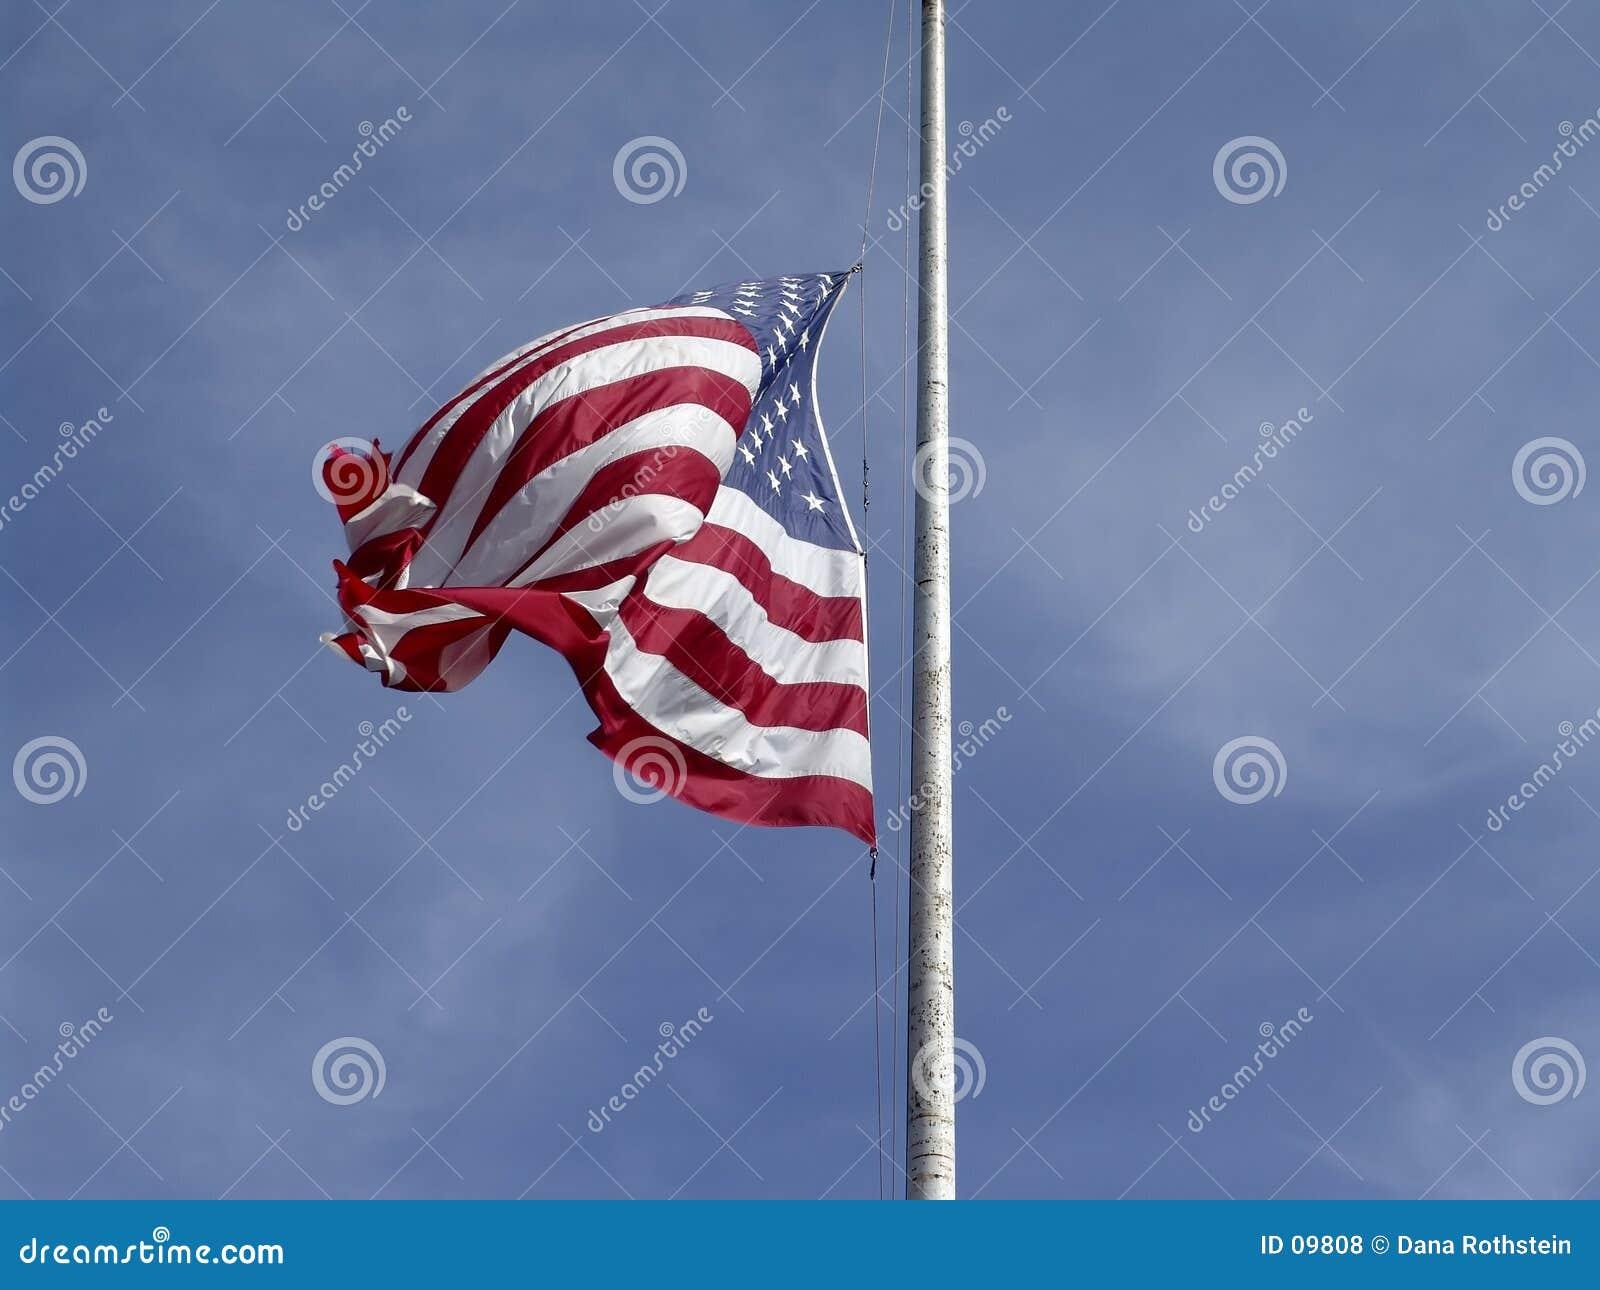 Flag at Half Mass